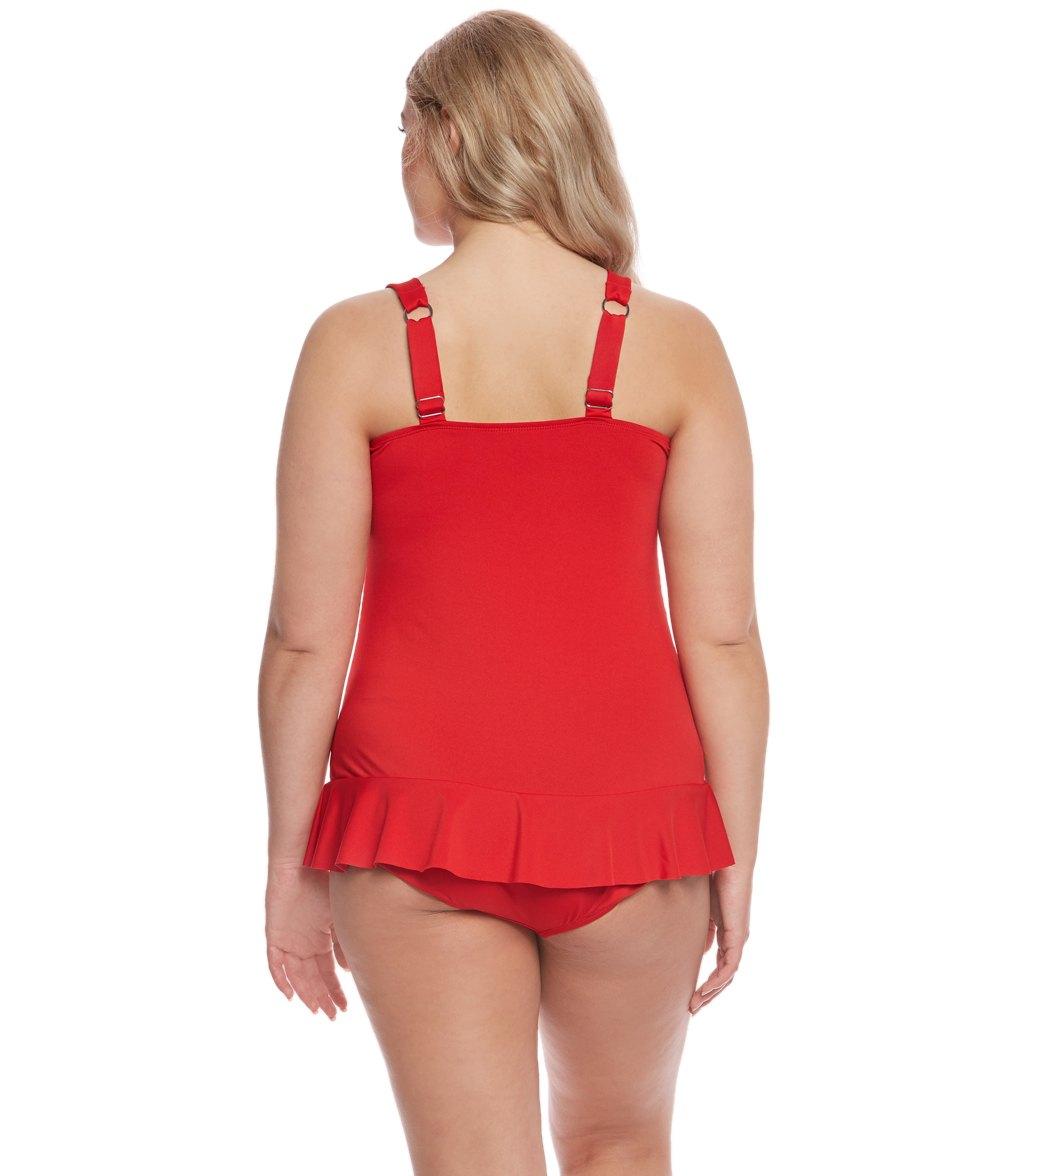 5a6f6bb16e4 Dolfin Aquashape Women s Plus Size Sweetheart Swim Dress at ...